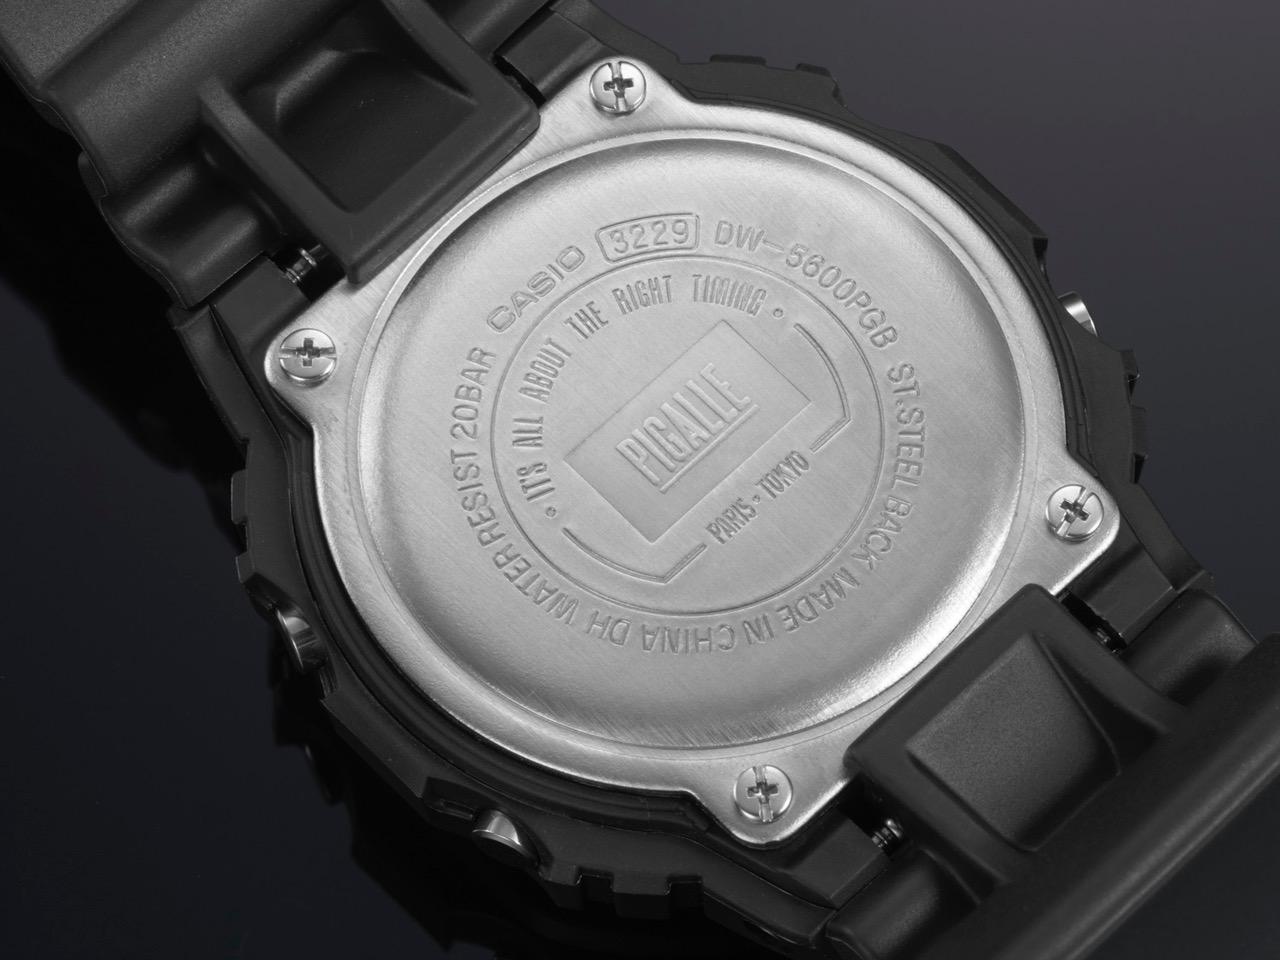 DW-5600PGB- 1錶背刻印上由PIGALLE LOGO所設計_____ __